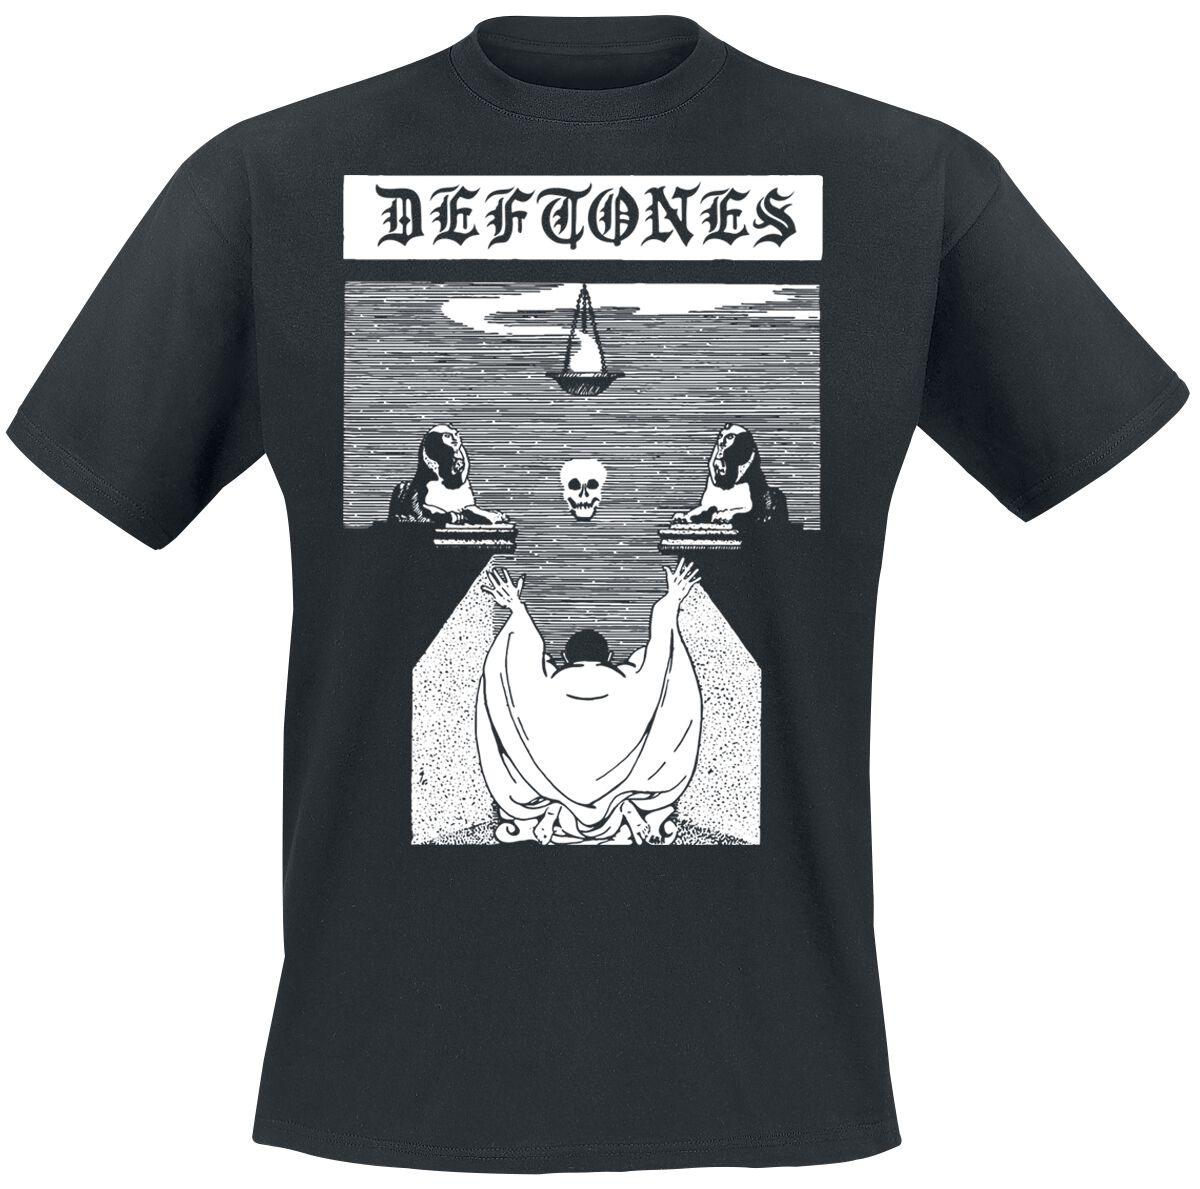 Zespoły - Koszulki - T-Shirt Deftones Ceremony T-Shirt czarny - 359516